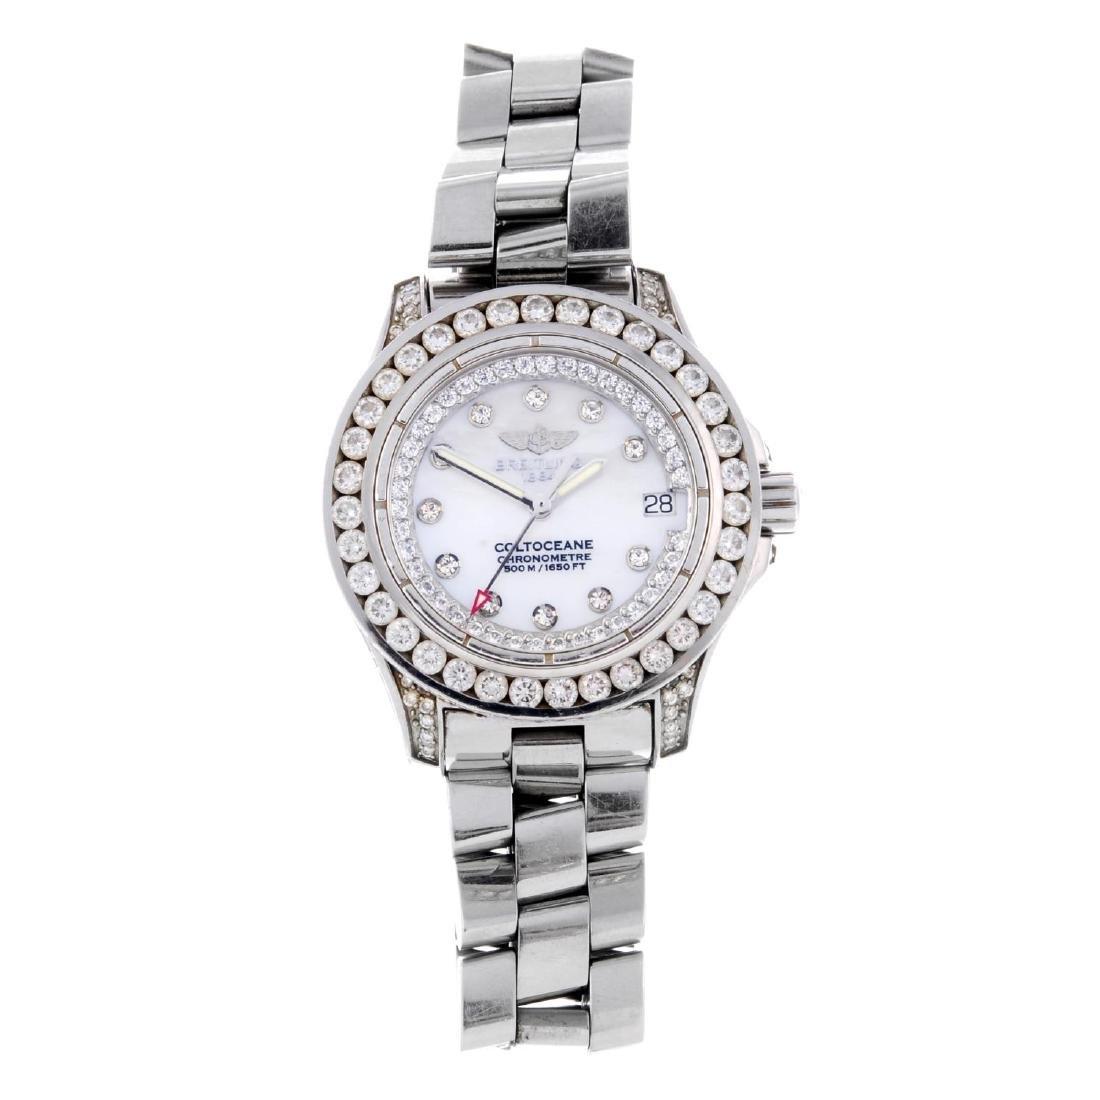 BREITLING - a lady's Colt Oceane bracelet watch.